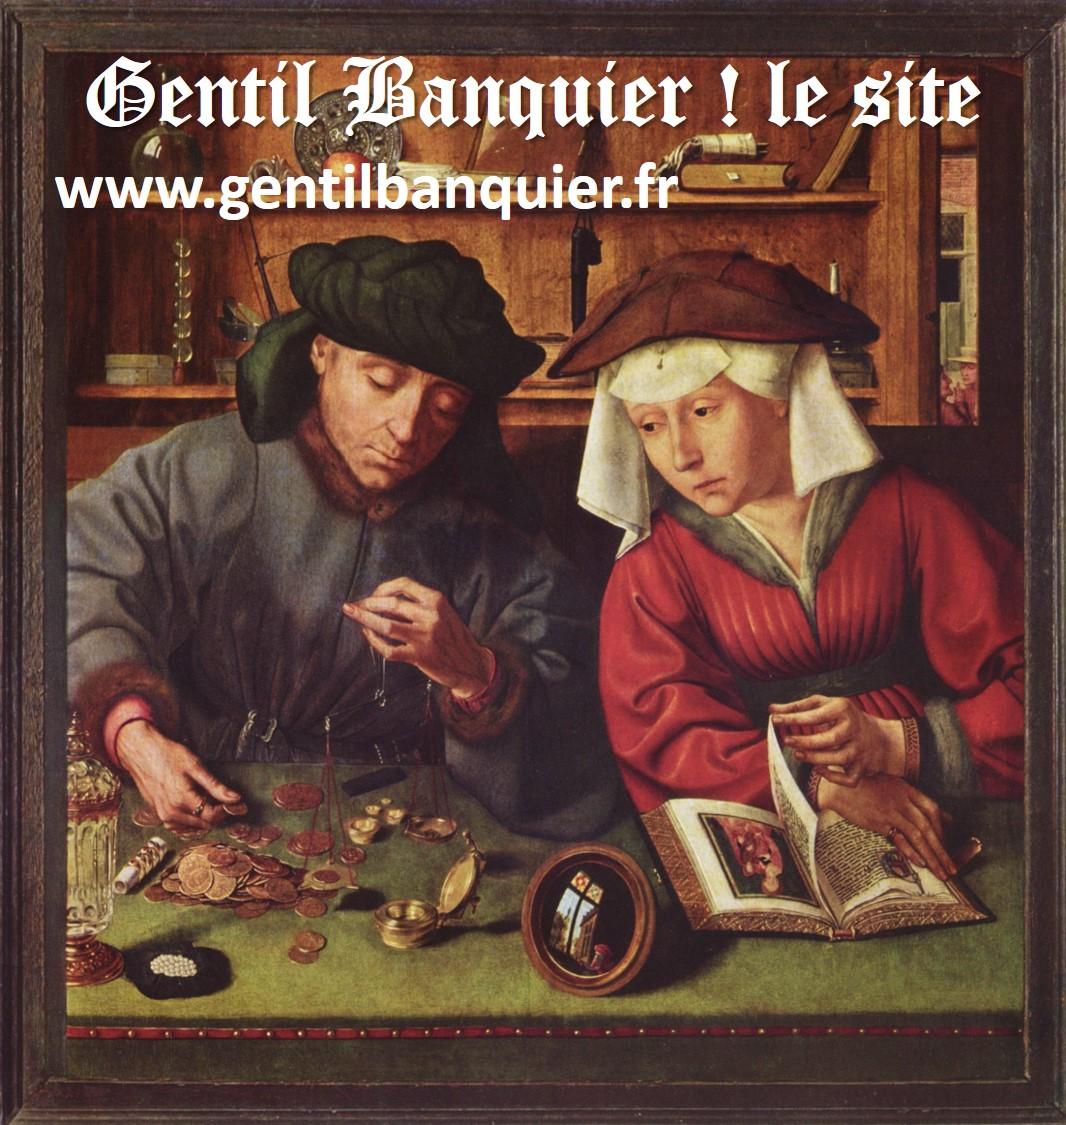 Gentil Banquier